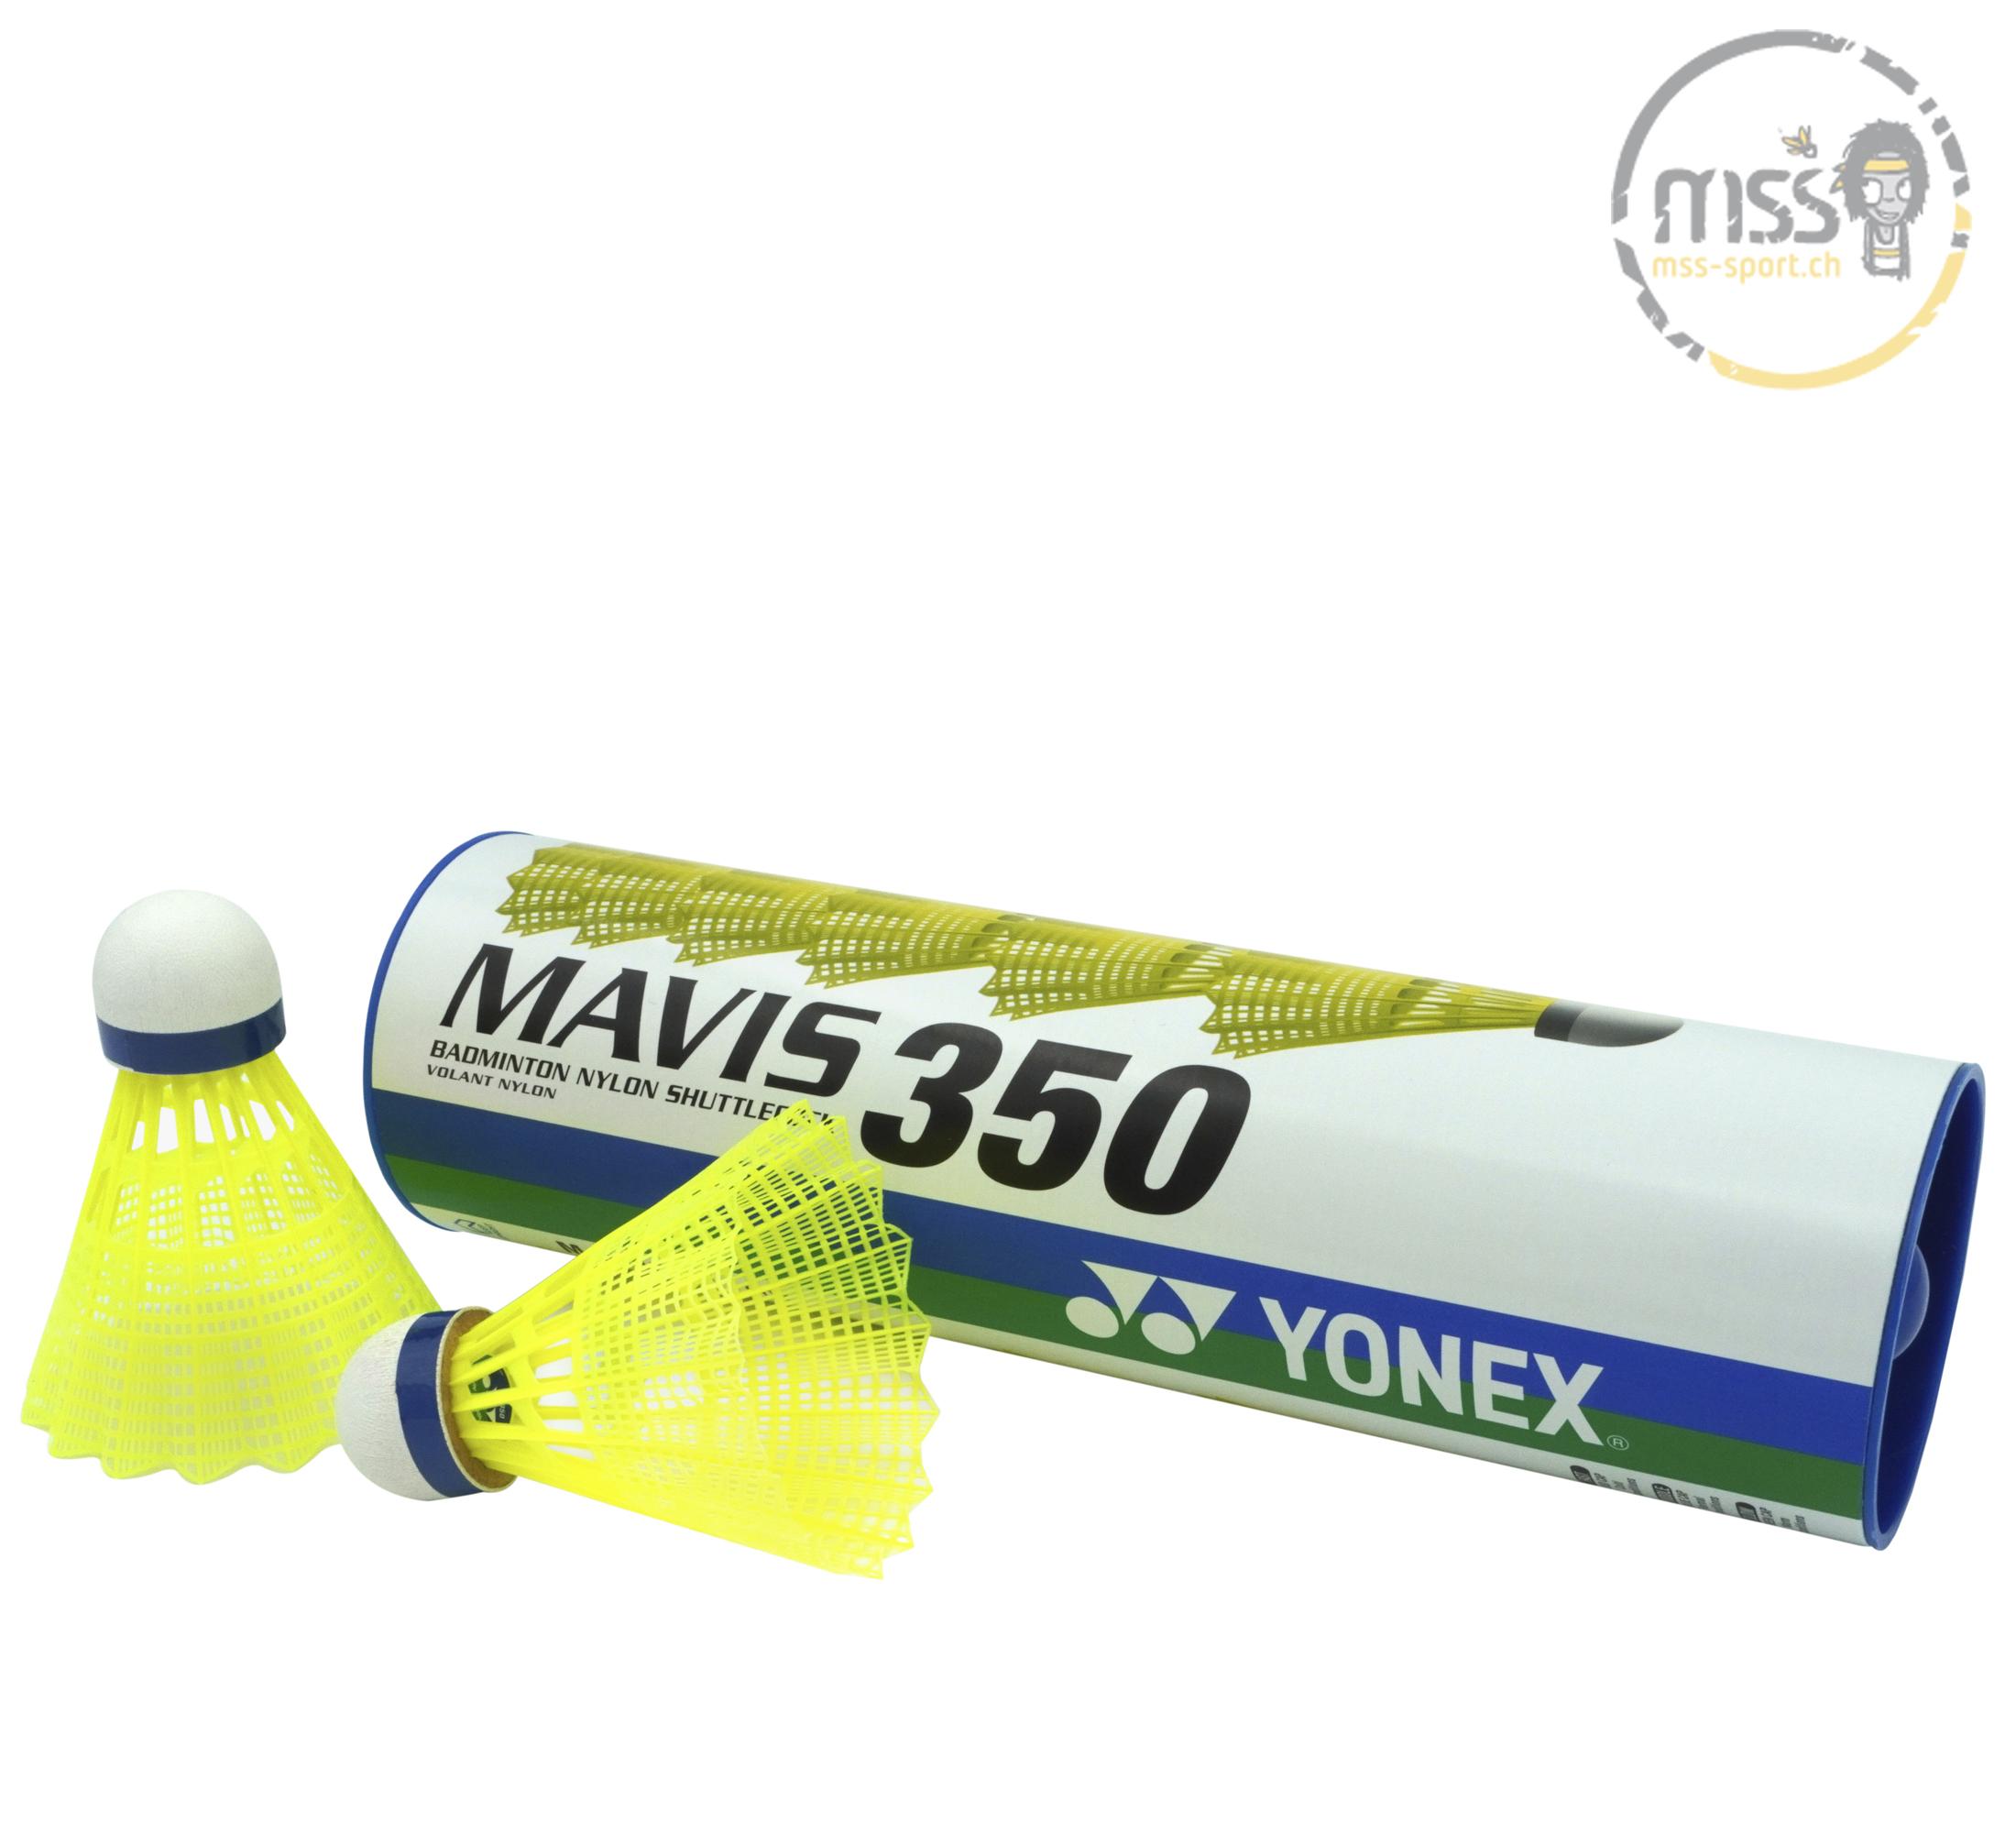 Yonex Mavis 350, yellow/blue